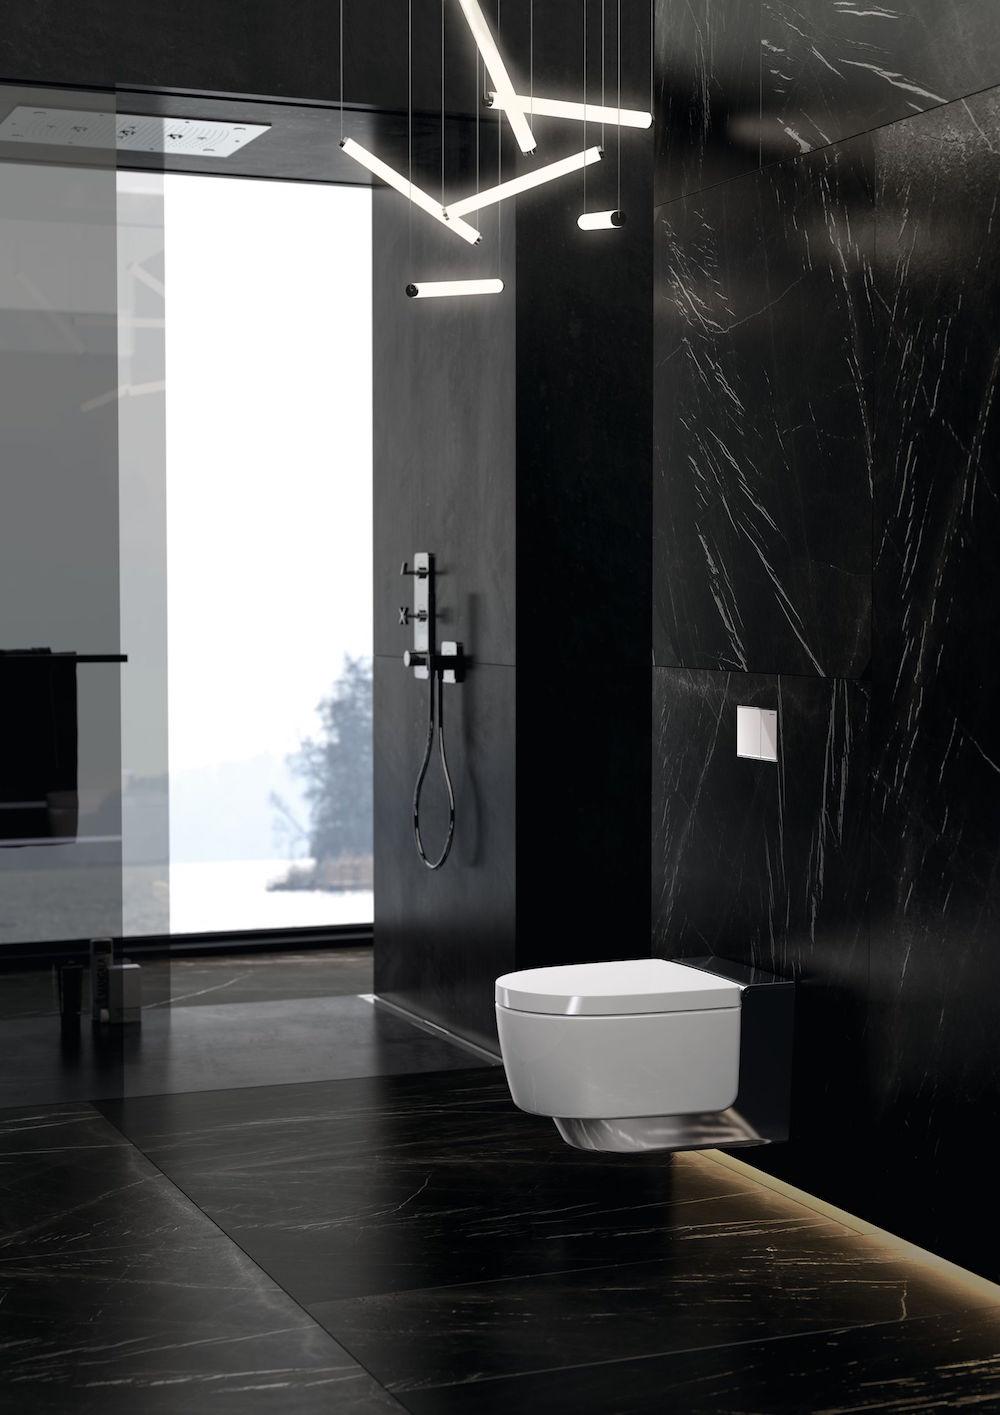 A black modern bathroom design